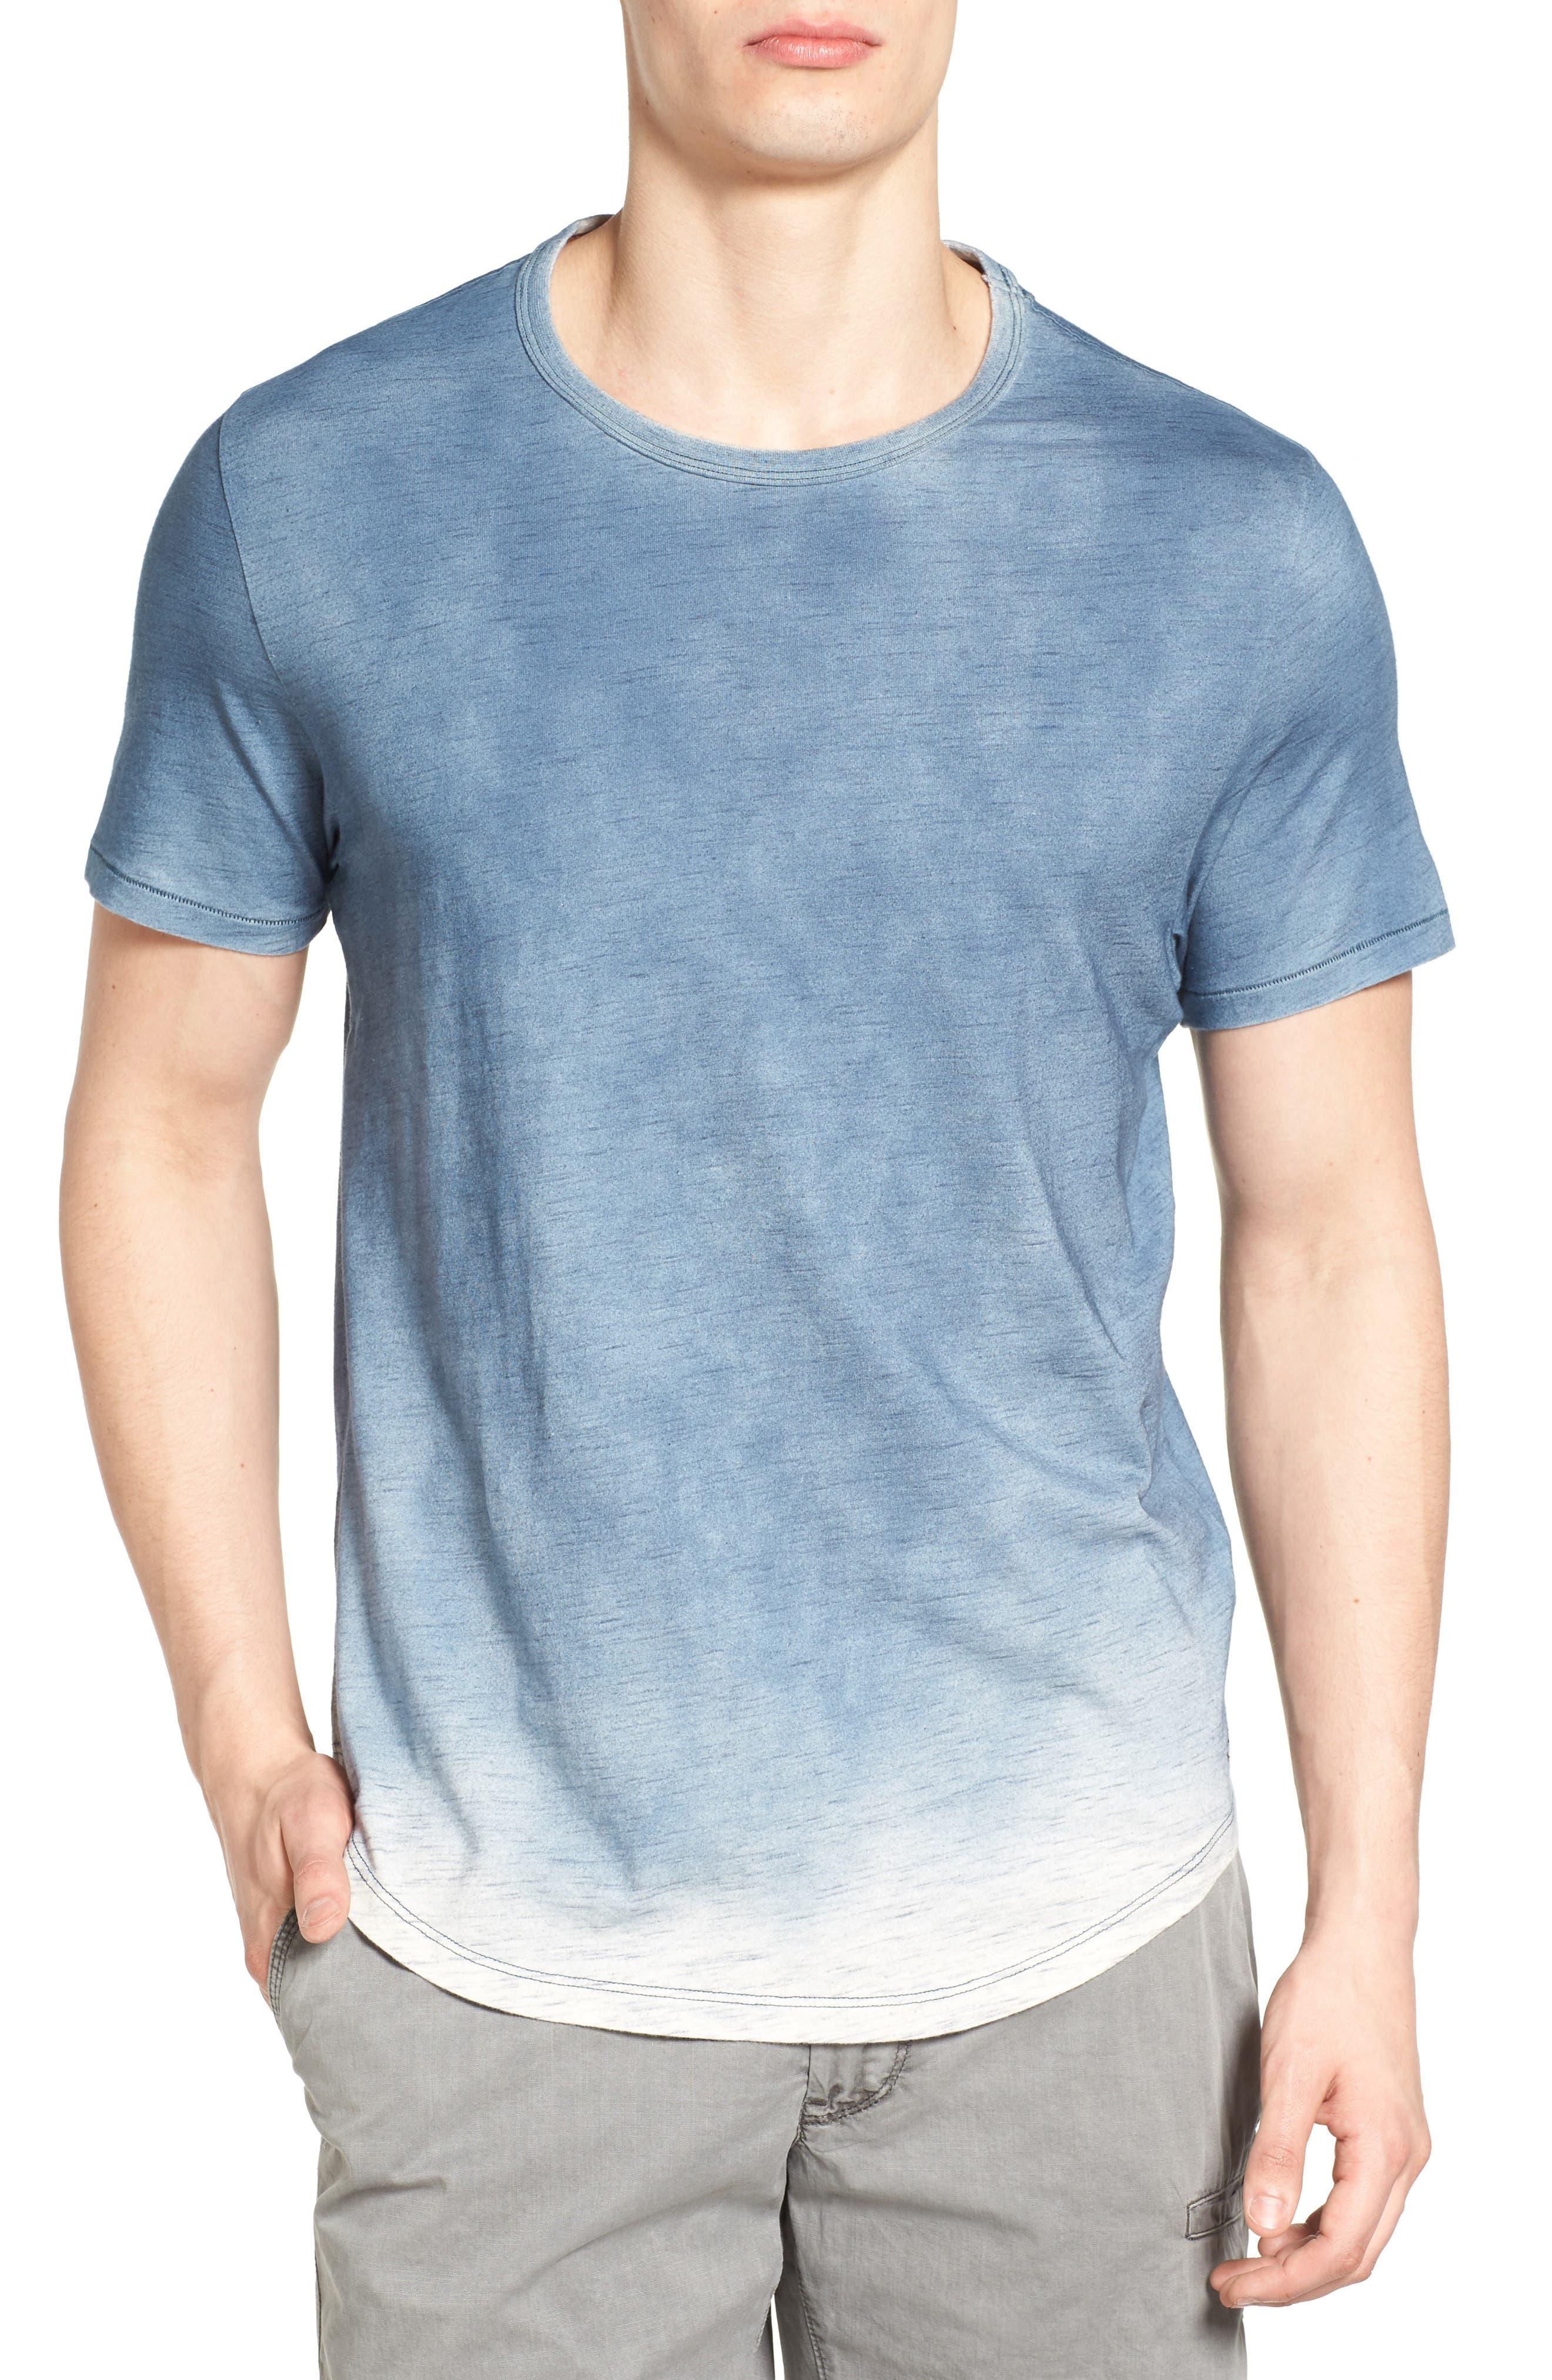 Alternate Image 1 Selected - Jeremiah Kendrick Spray Heather Jersey T-Shirt